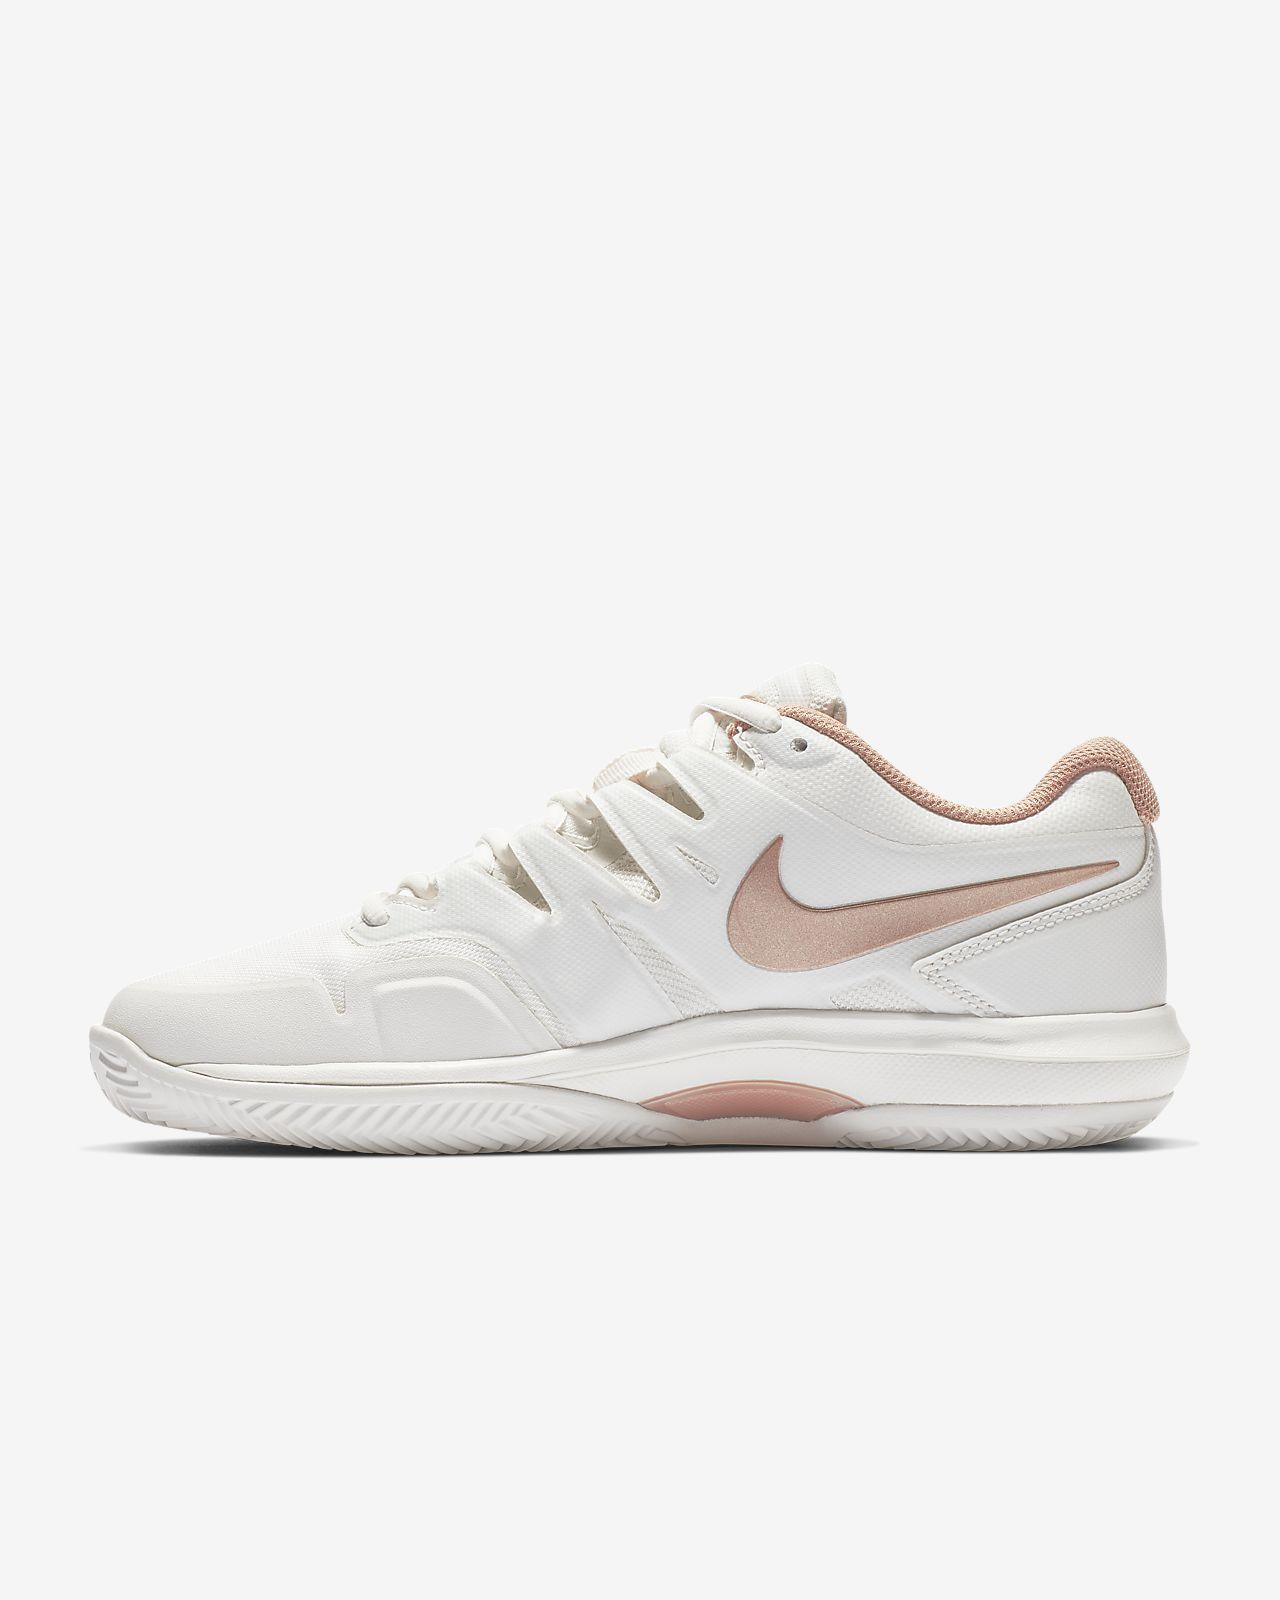 Nike Air Zoom Prestige Clay Damen-Tennisschuh